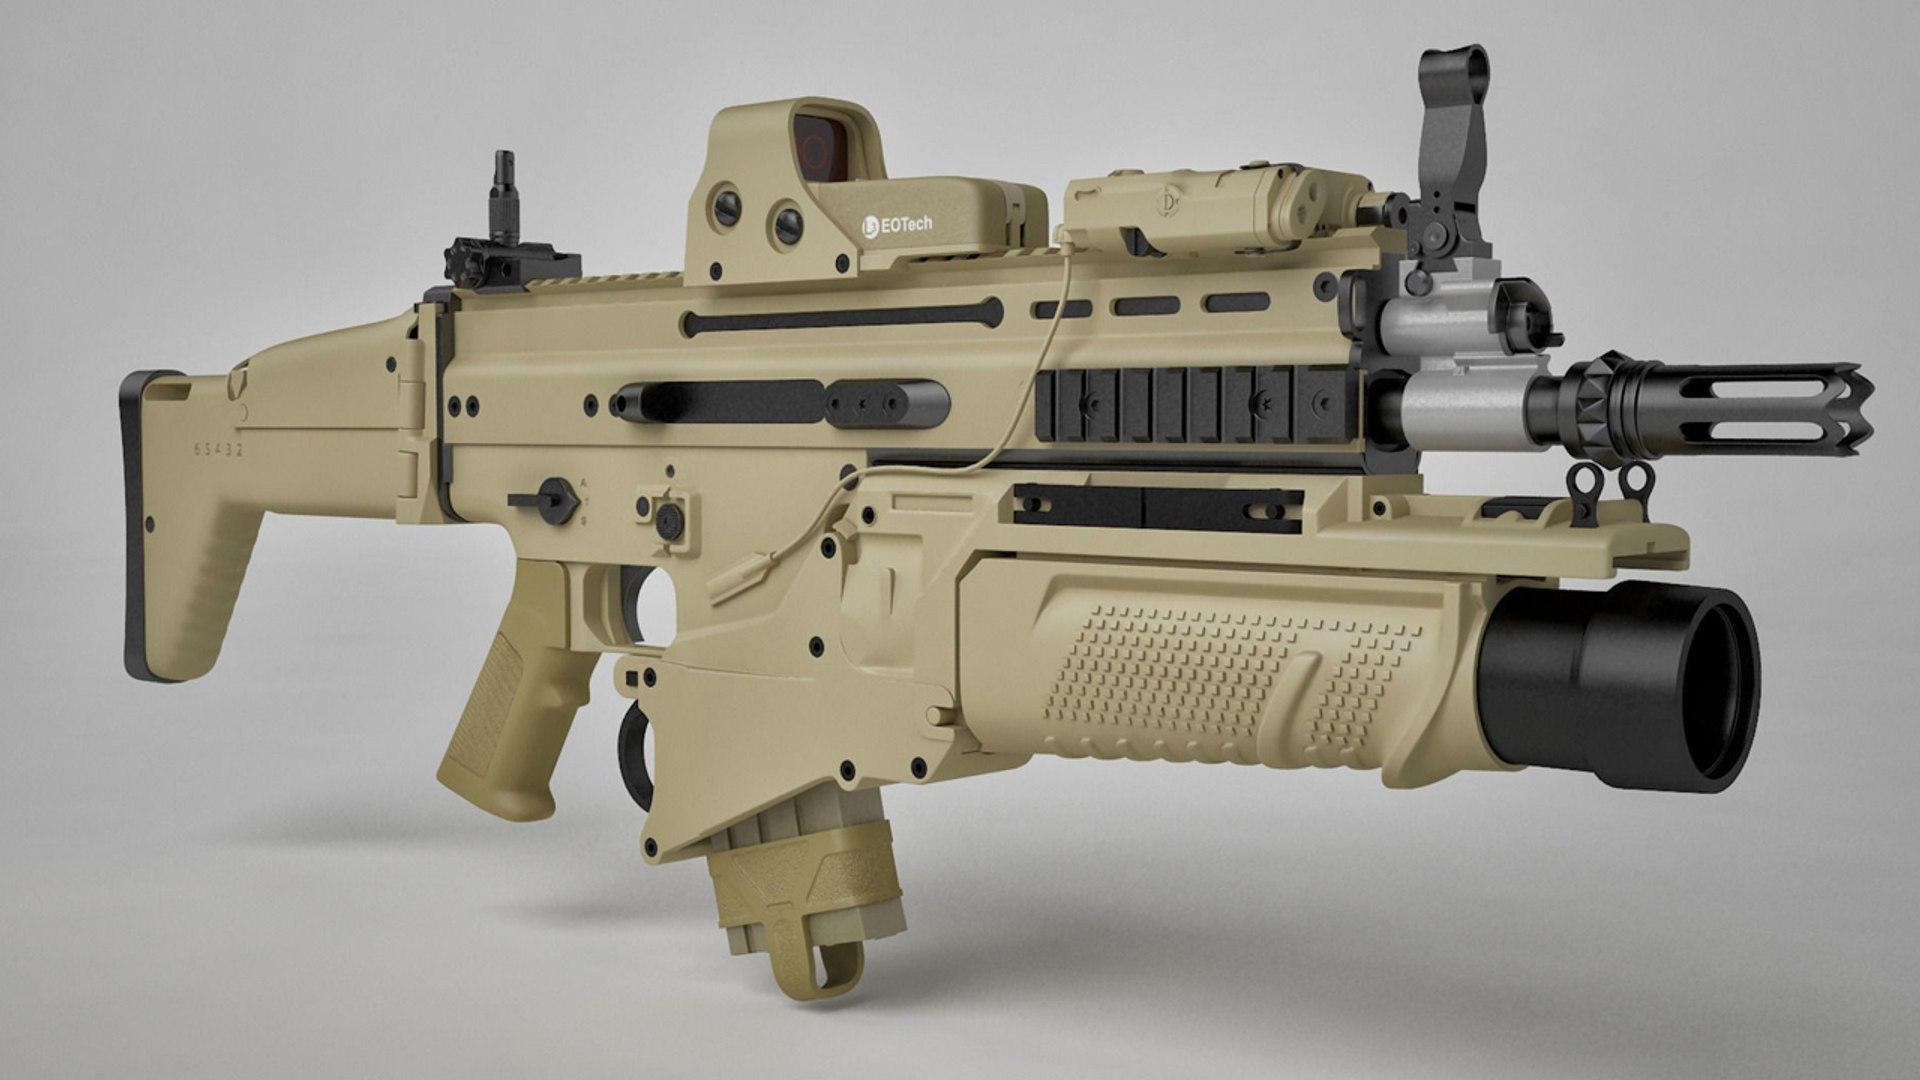 Top 10 Best Assault Rifles In the World